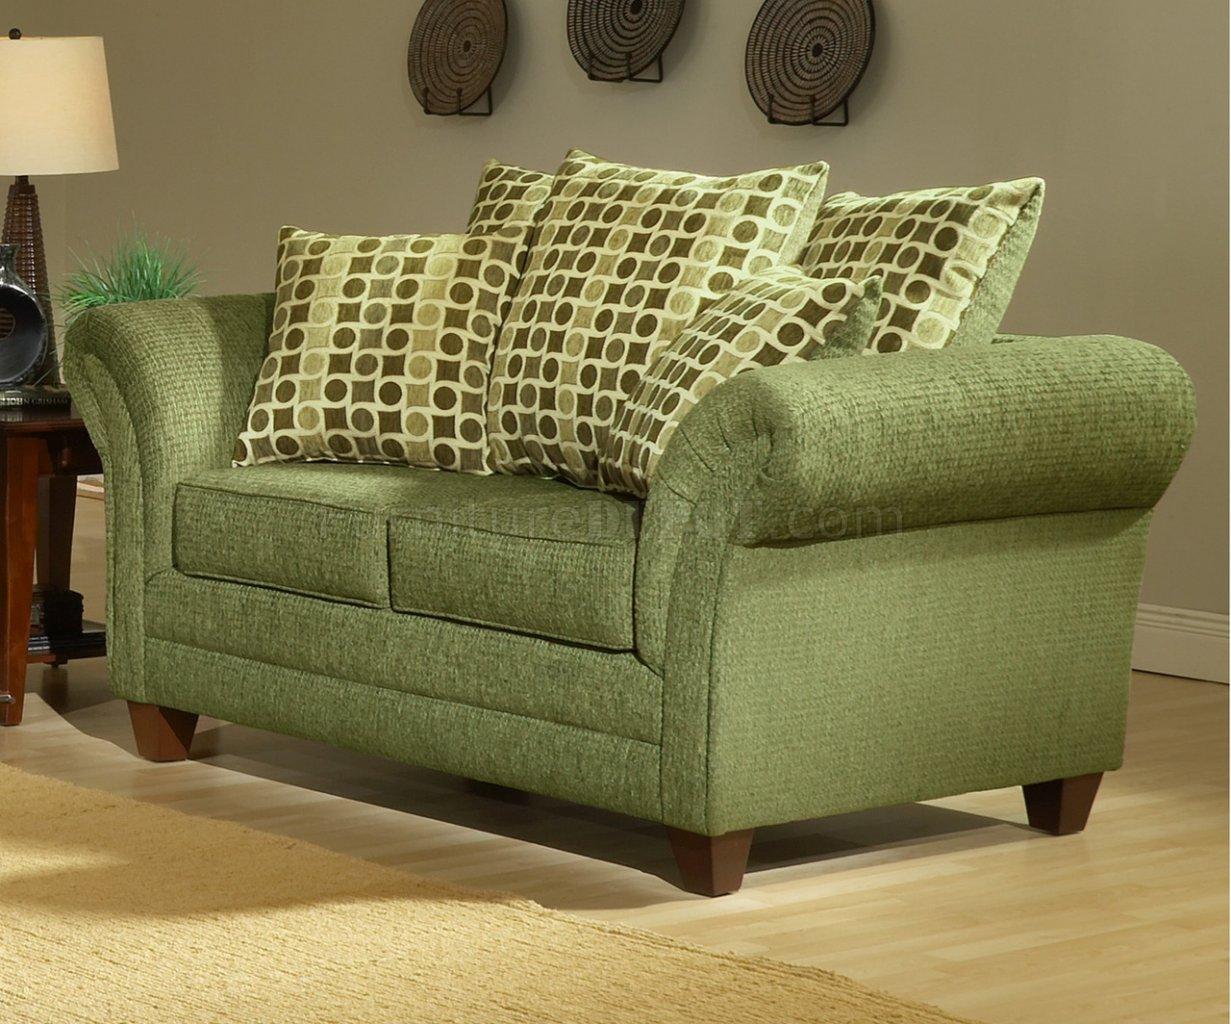 green fabric sofas bel air sofa reviews light forest modern living room